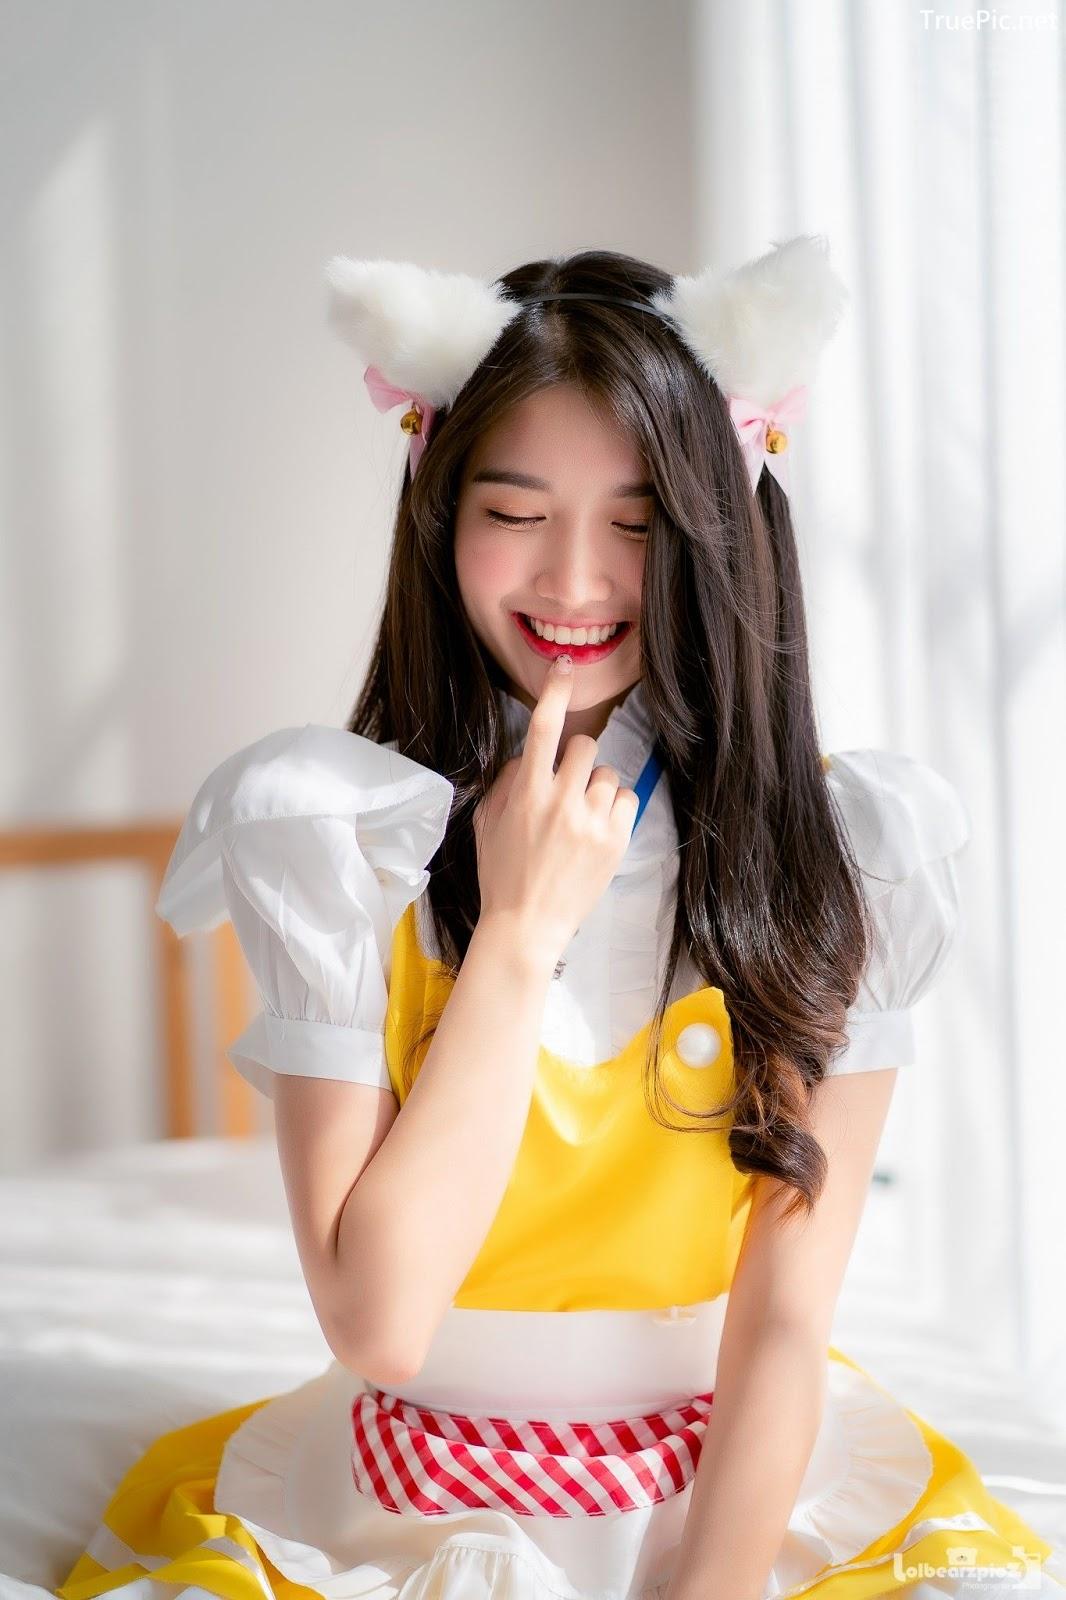 Image Thailand Model - Yatawee Limsiripothong - Cute Maid - TruePic.net - Picture-4